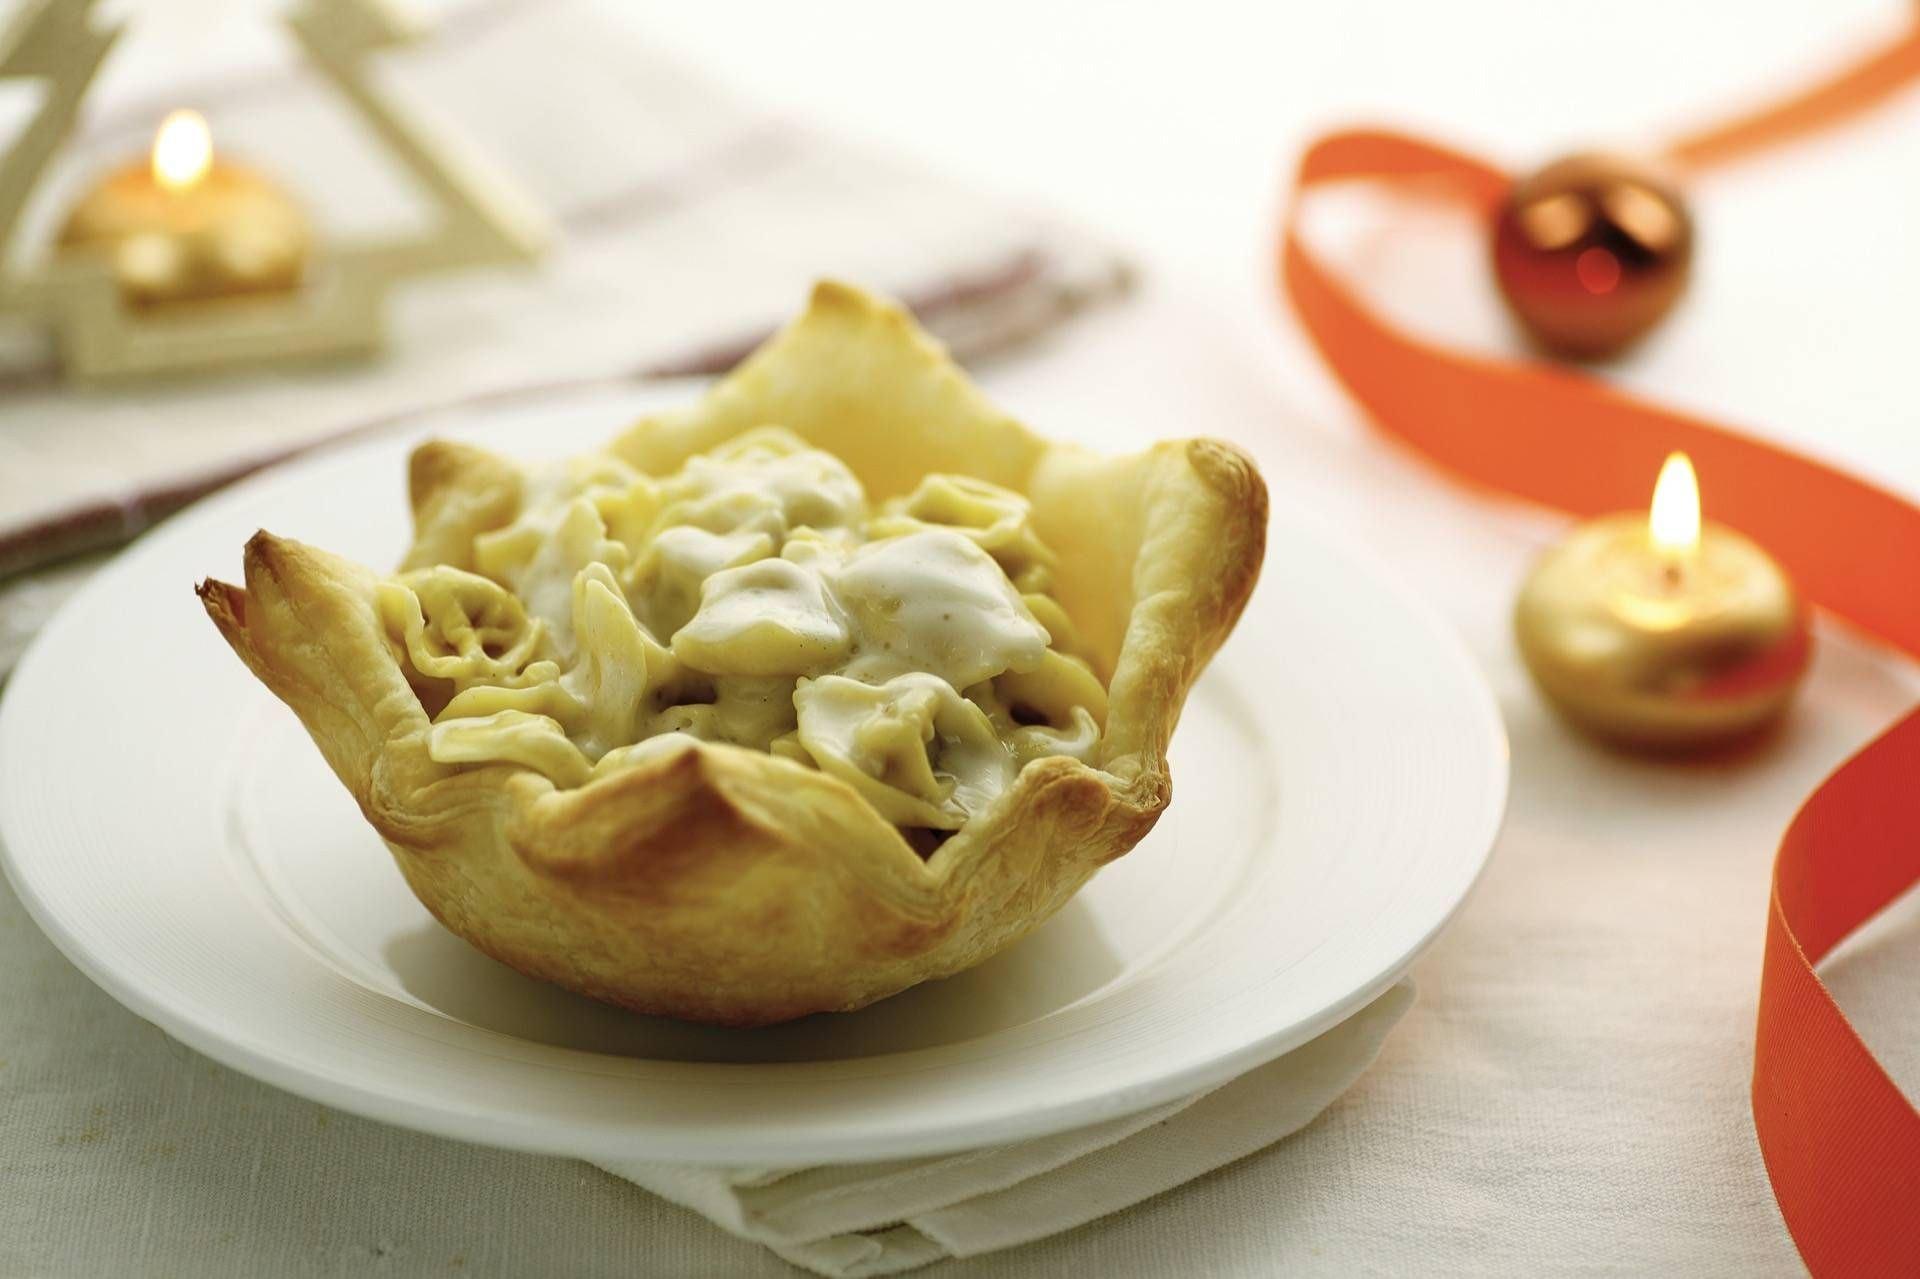 Tortellini cremosi in crosta di sfoglia - Parmalat